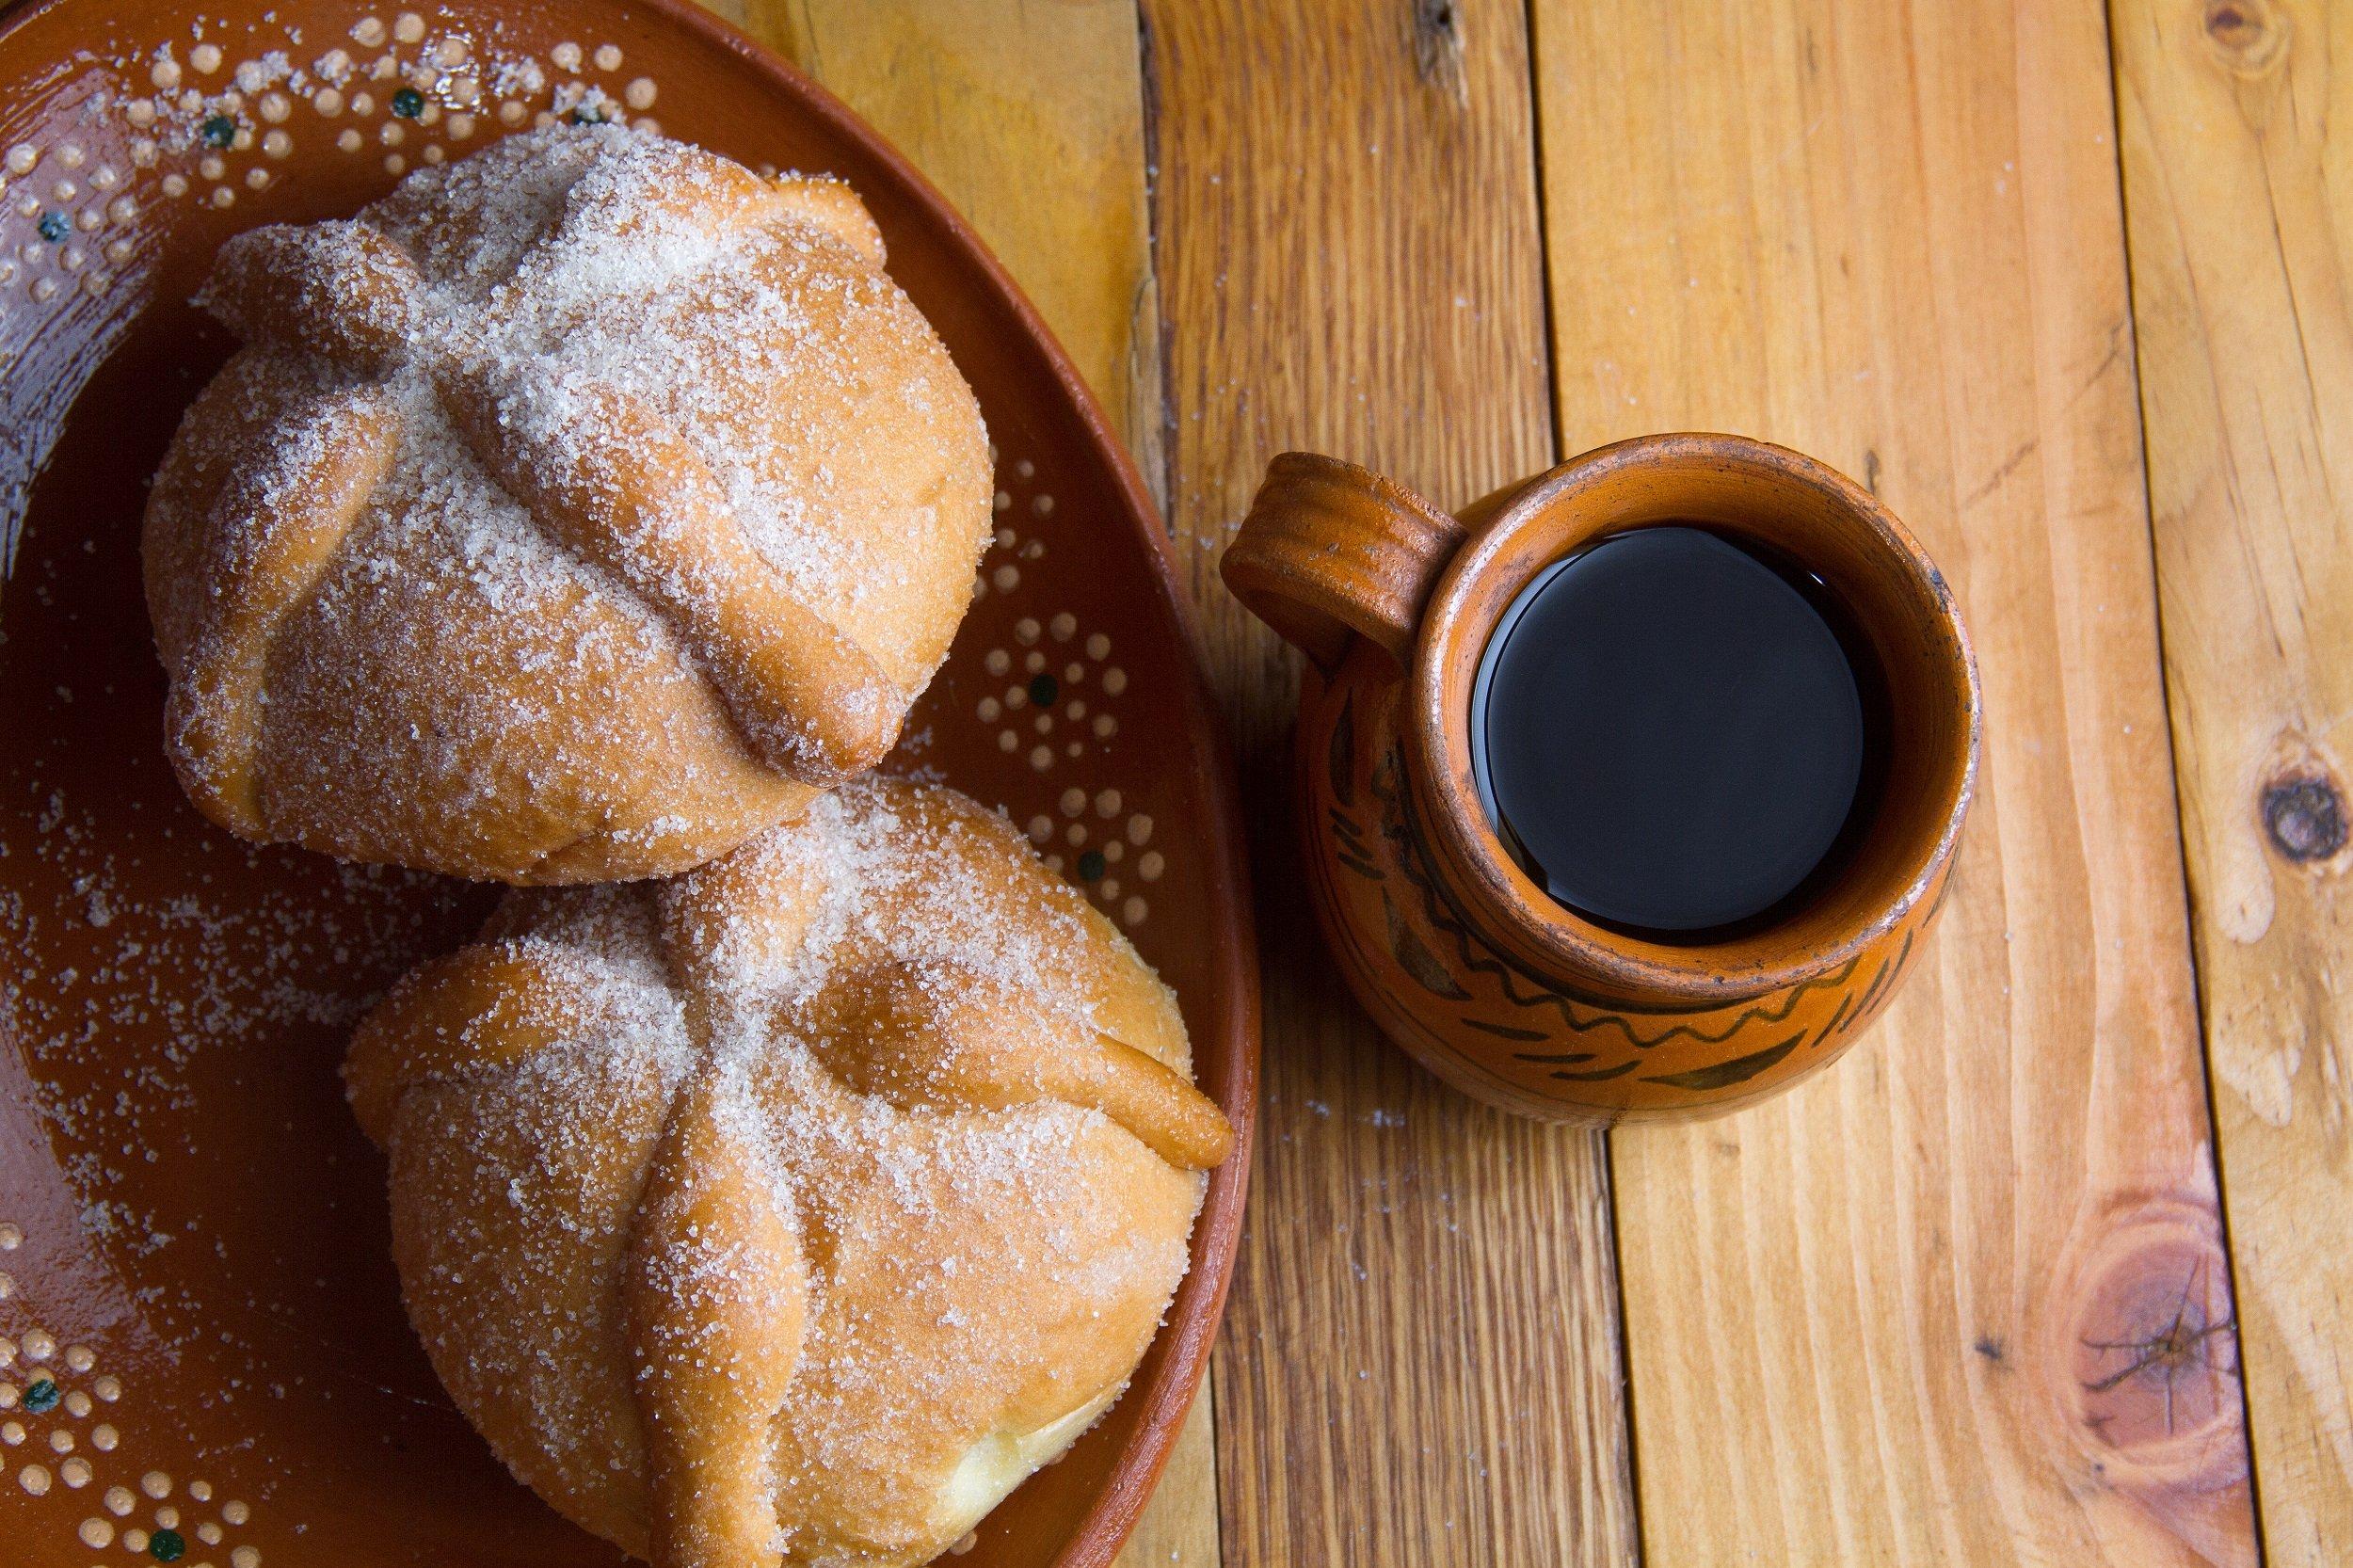 Huatulco Culture & Coffee Tour